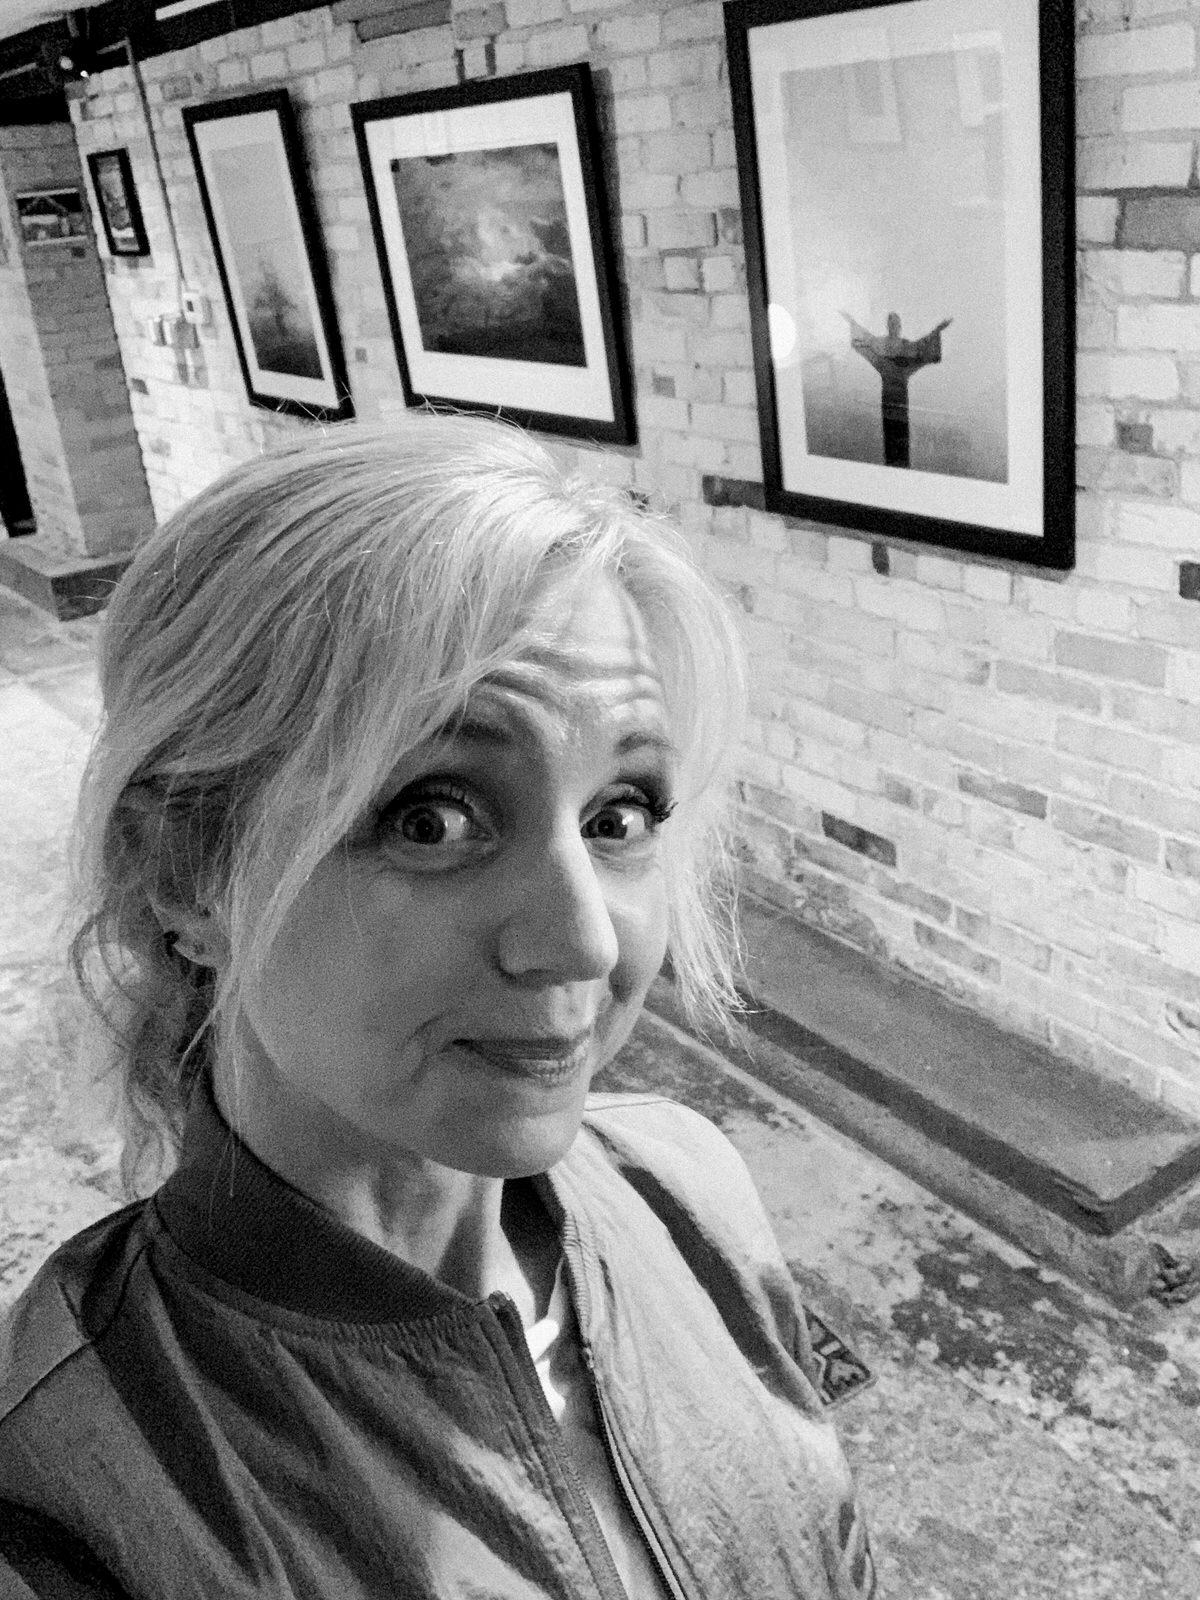 Self-Portrait-Studio-L-Photographer-Laura-Schneider-at-art-exhibition-Honey-and-Ace-_7589